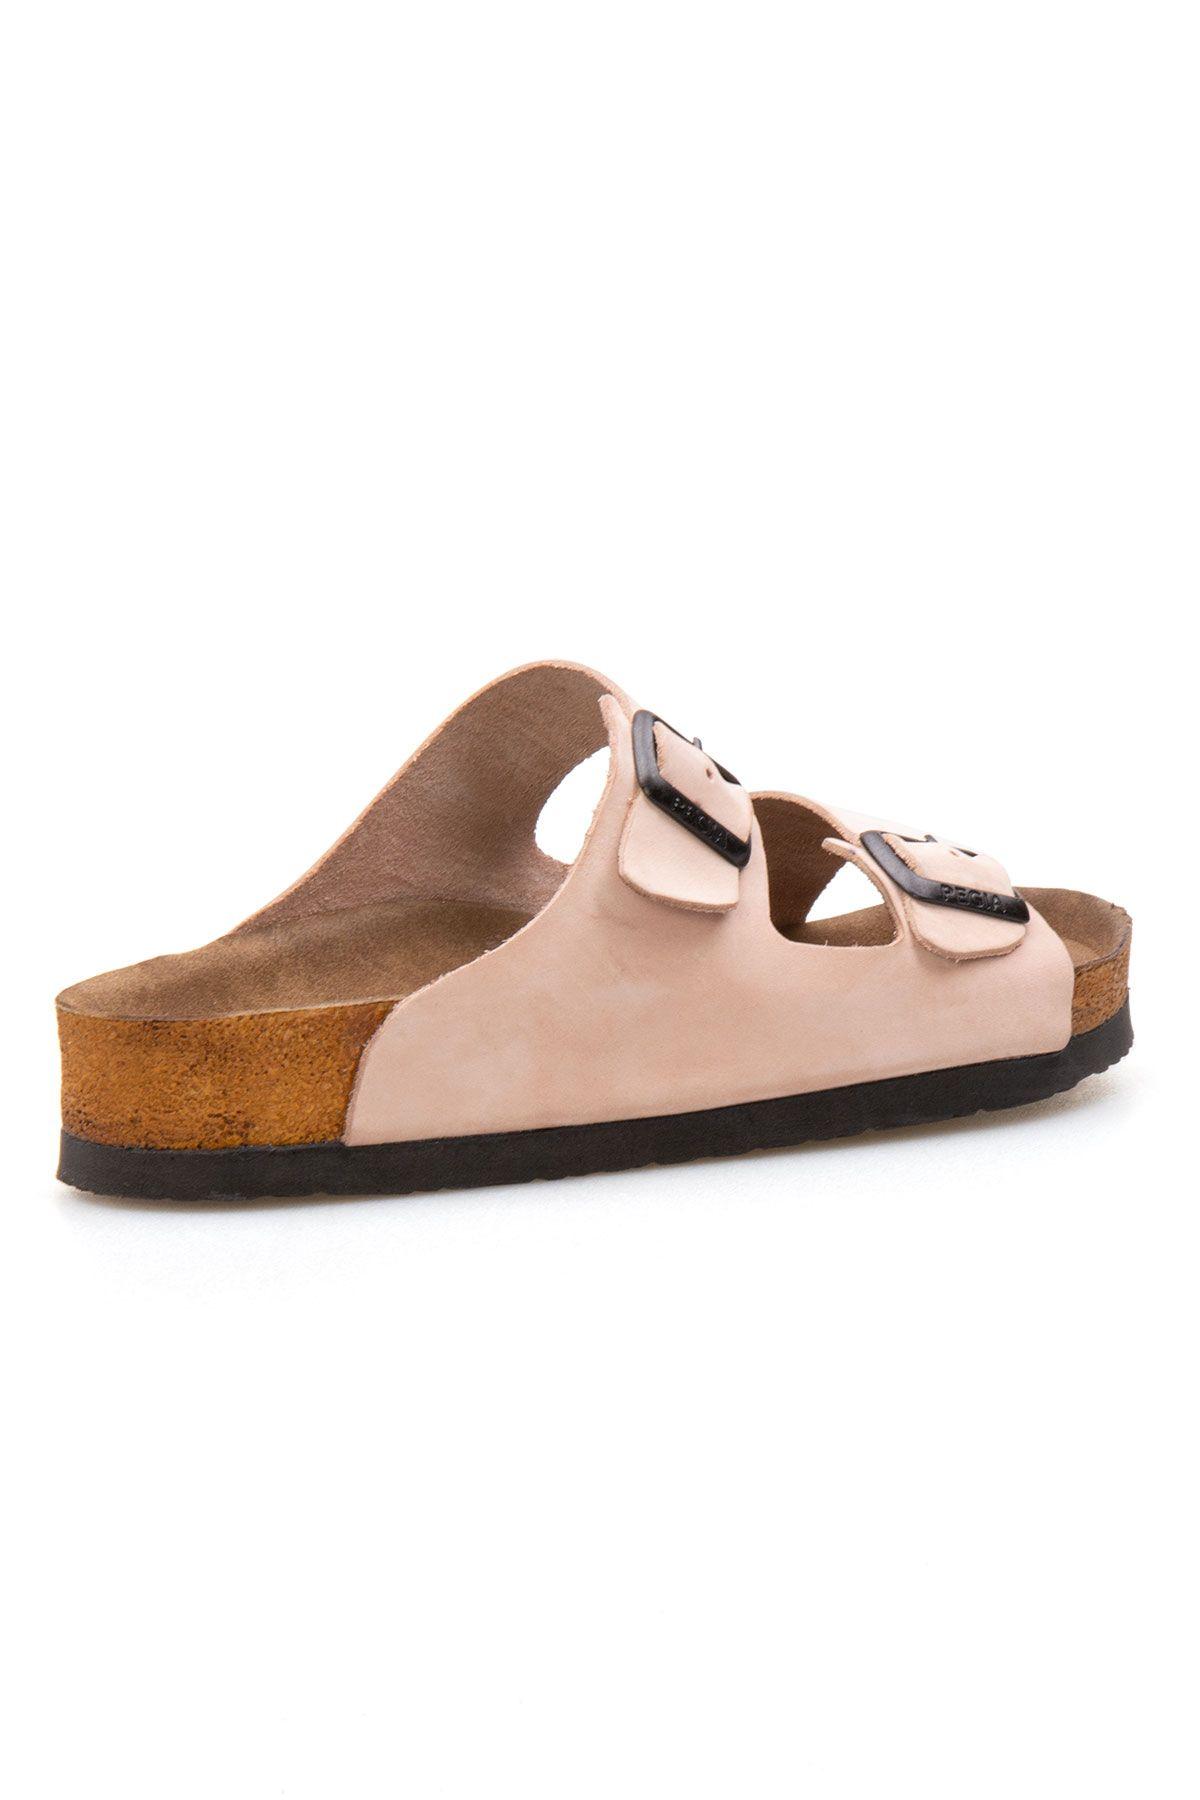 Pegia Genuine Leather Strap Women's Slippers 215510 Powdery